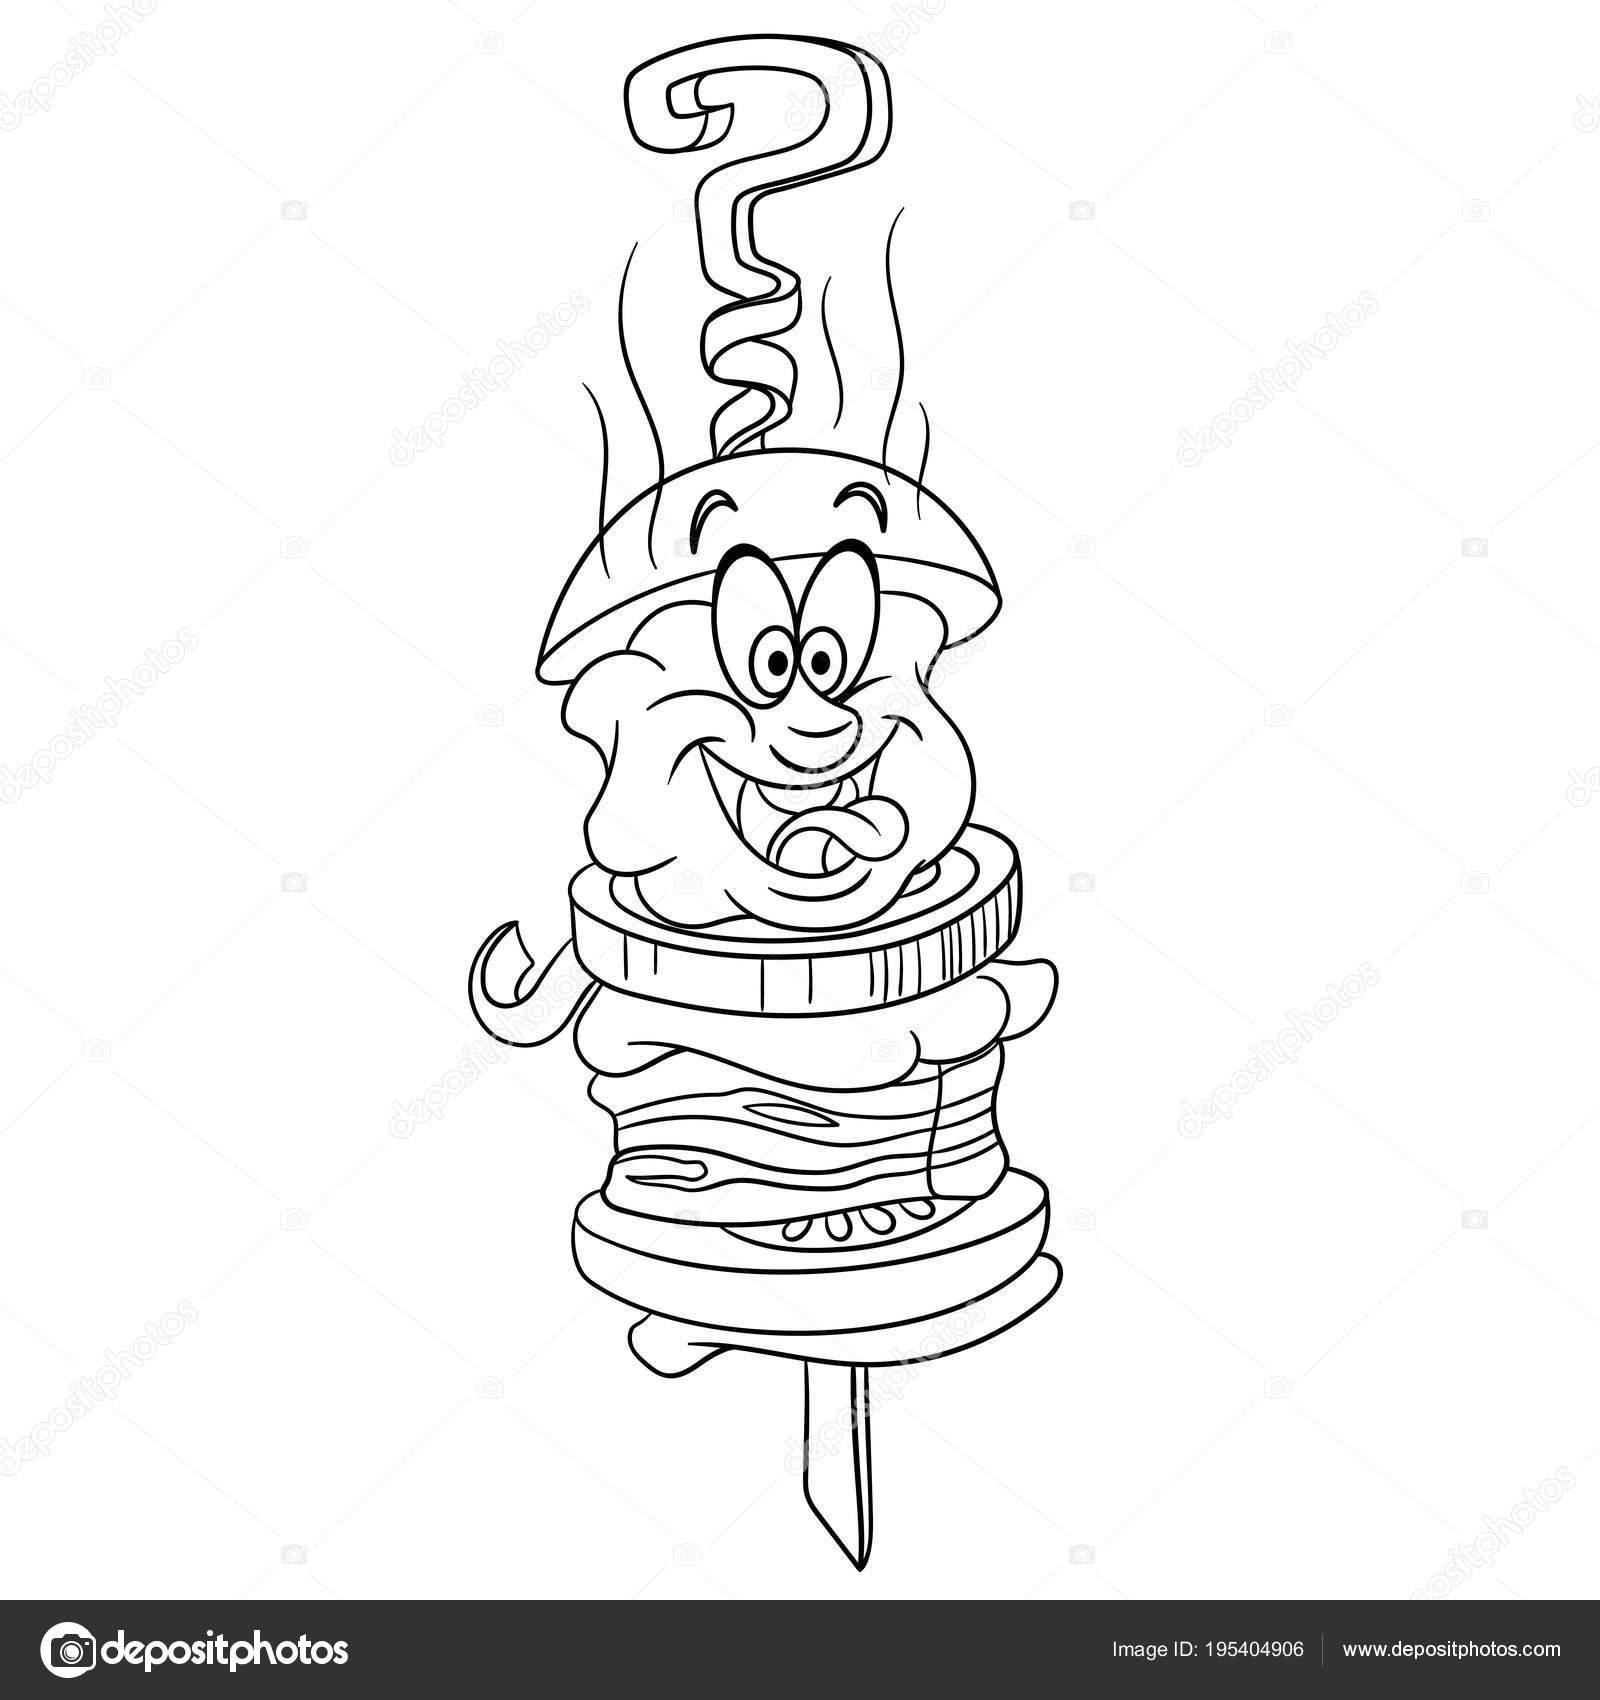 Dessin Barbecue dessin animé barbecue alimentaire — image vectorielle sybirko